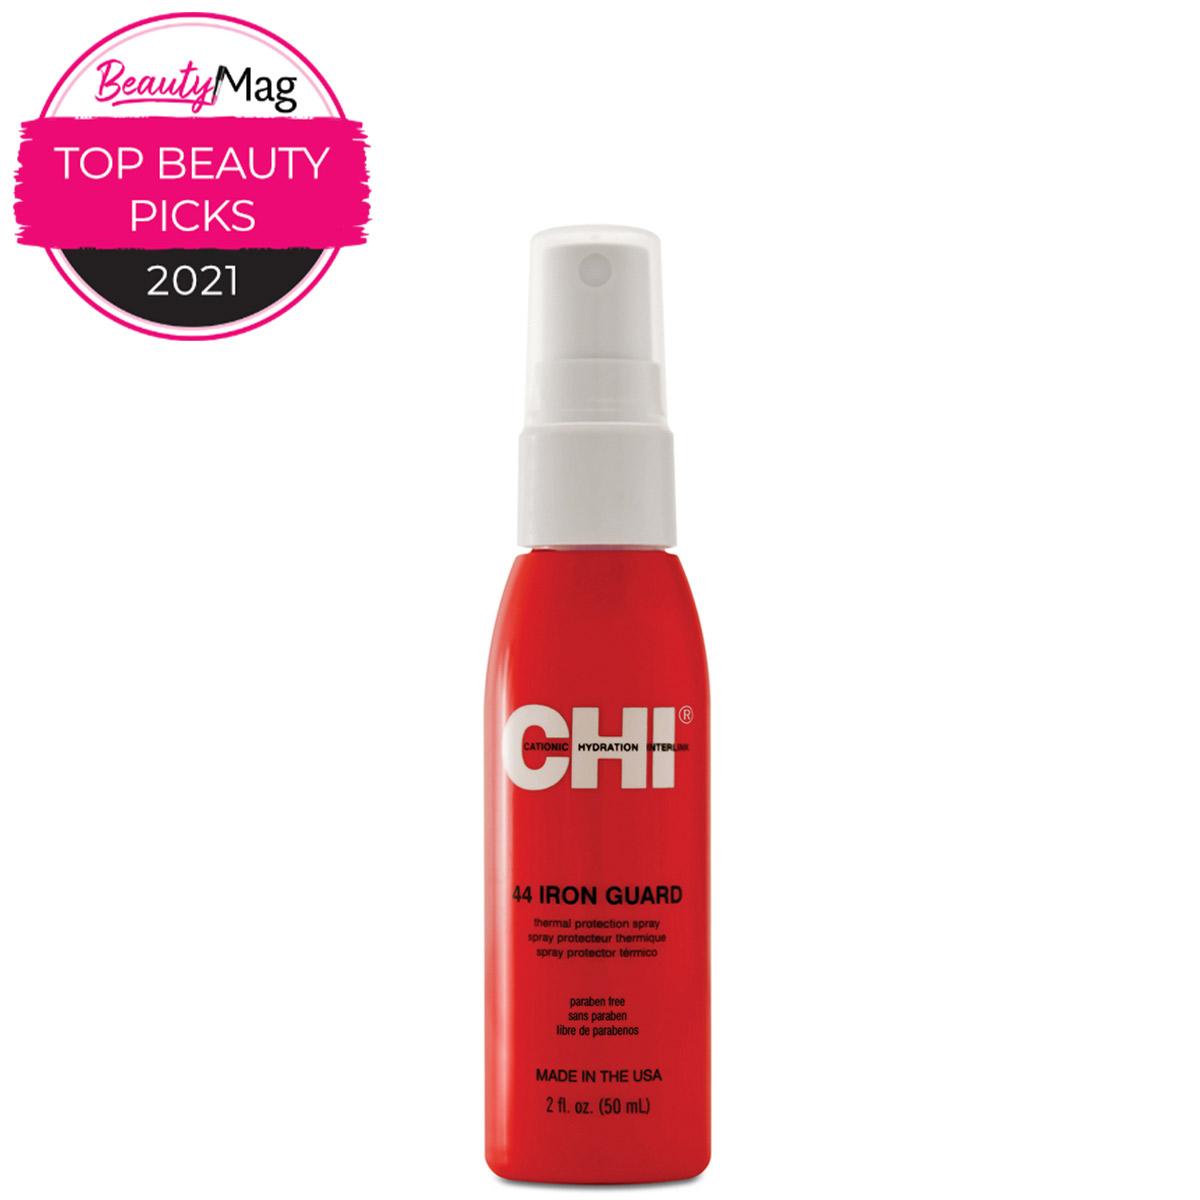 CHI 44 Iron Guard Thermal Protection Spray Primer